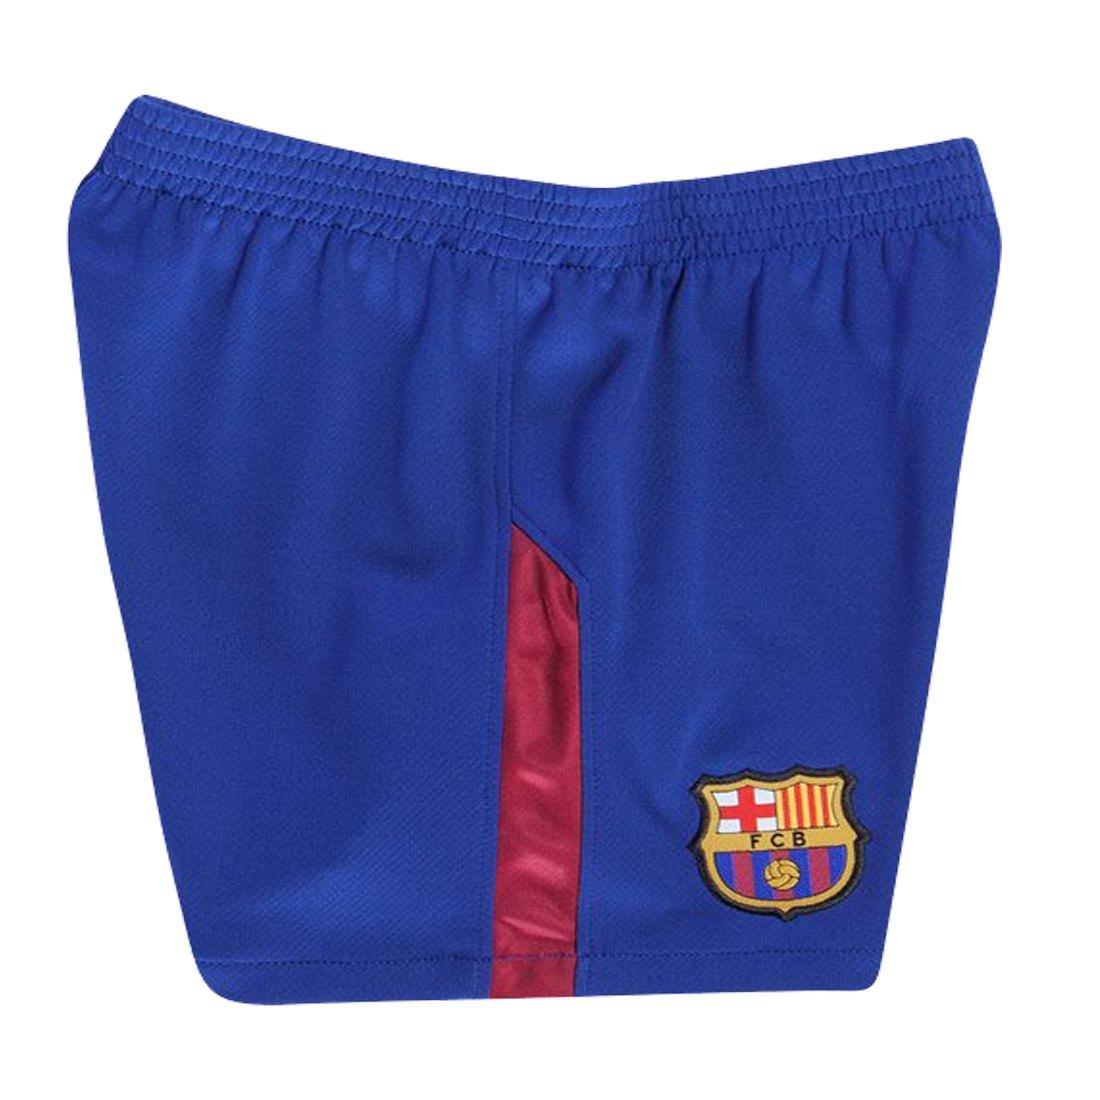 a17c78577 BARCA2018 Barcelona NB Messi Suarez Iniesta Neymar 2017 2018 17 18 Kid  Youth Replica Home Jersey ...